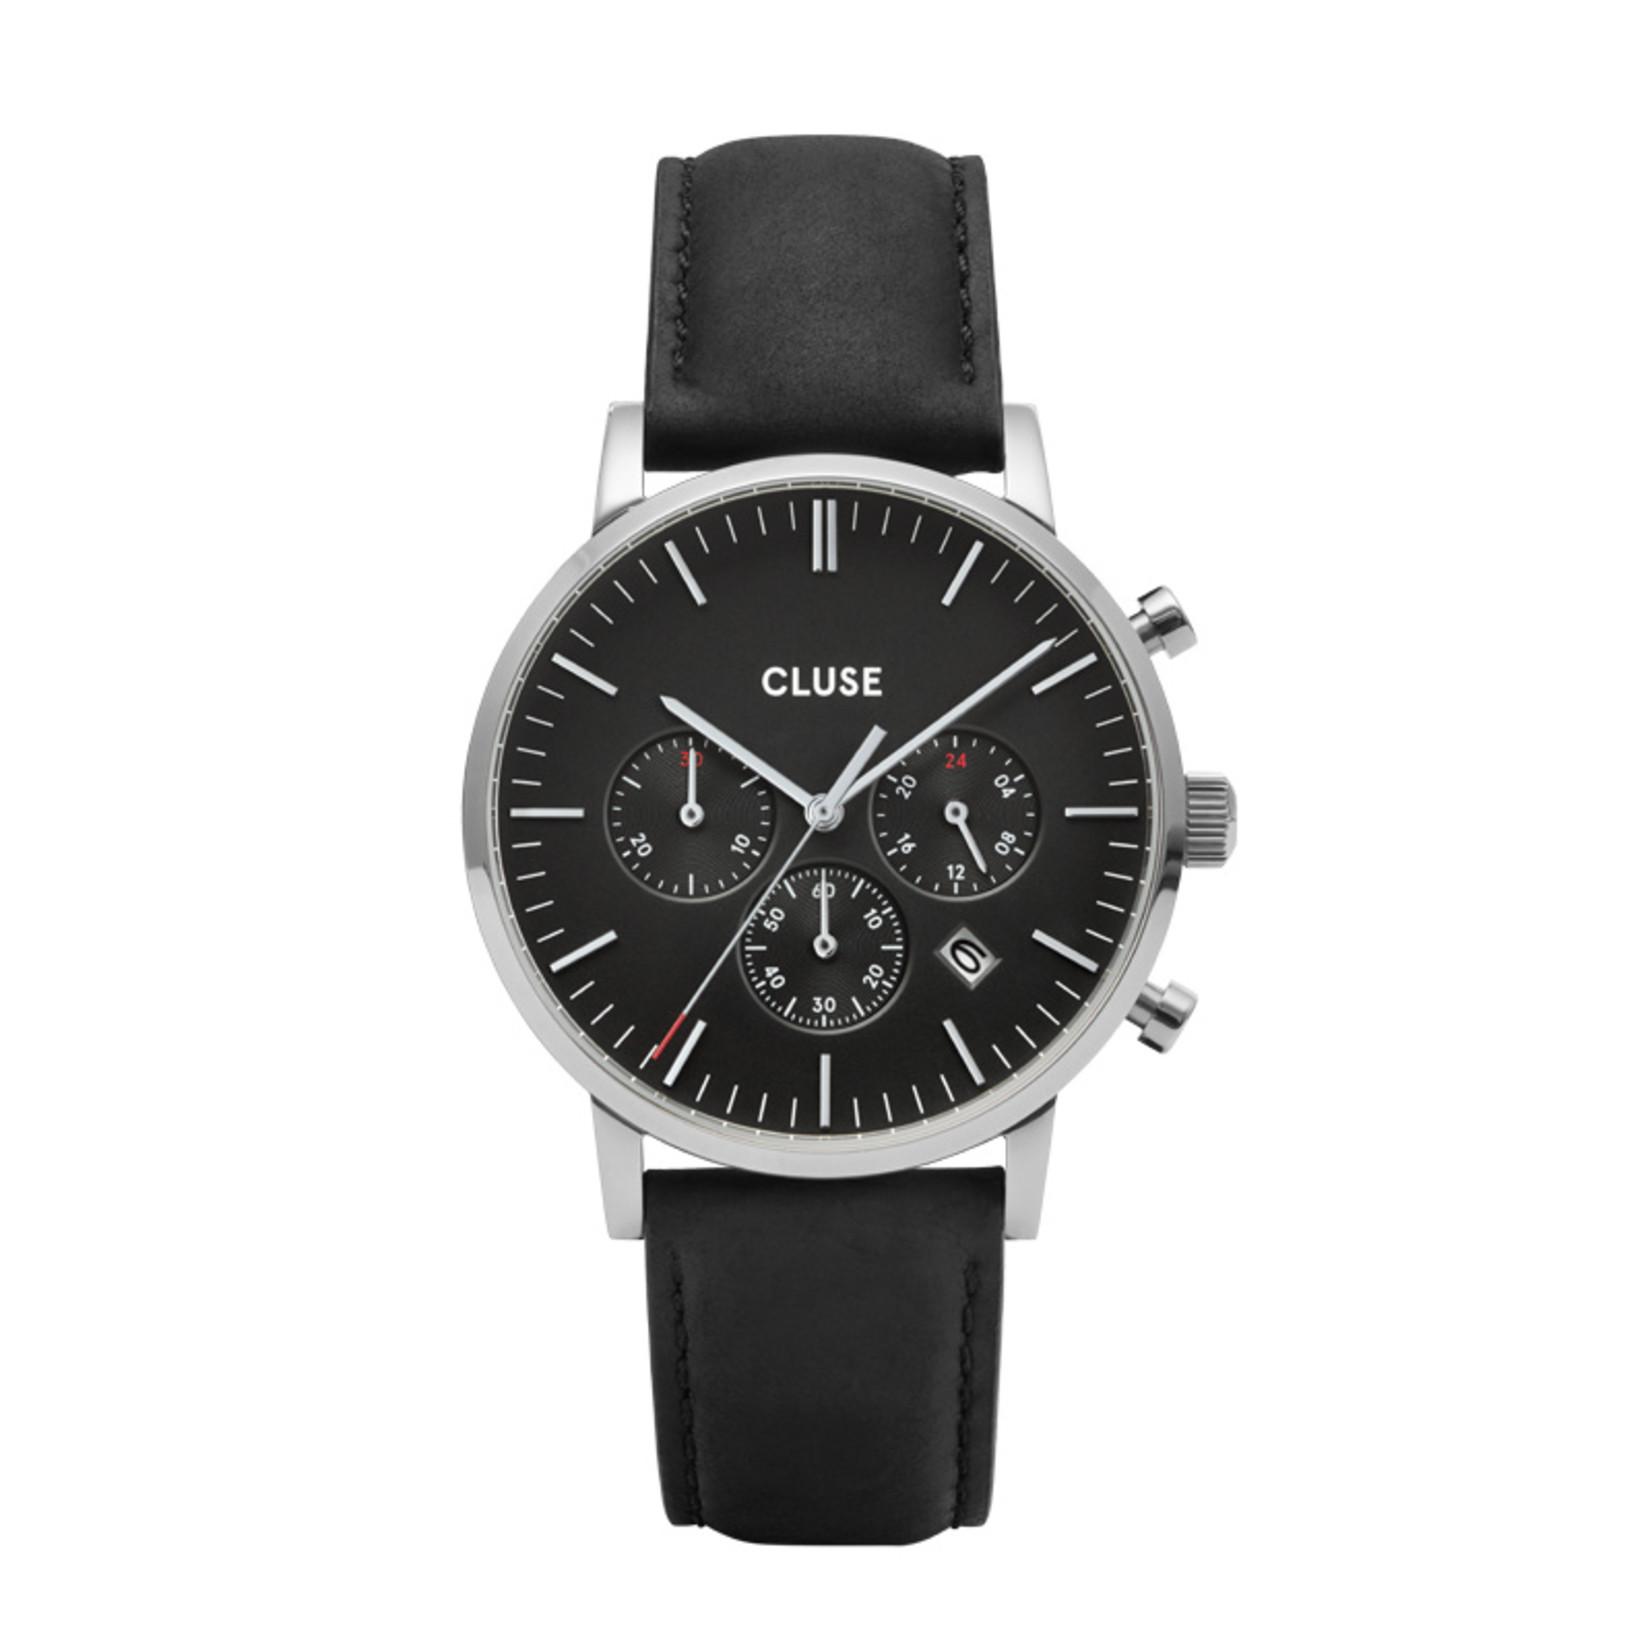 Cluse Cluse Uhr Aravis schwarz I Chronograph I Leder schwarz